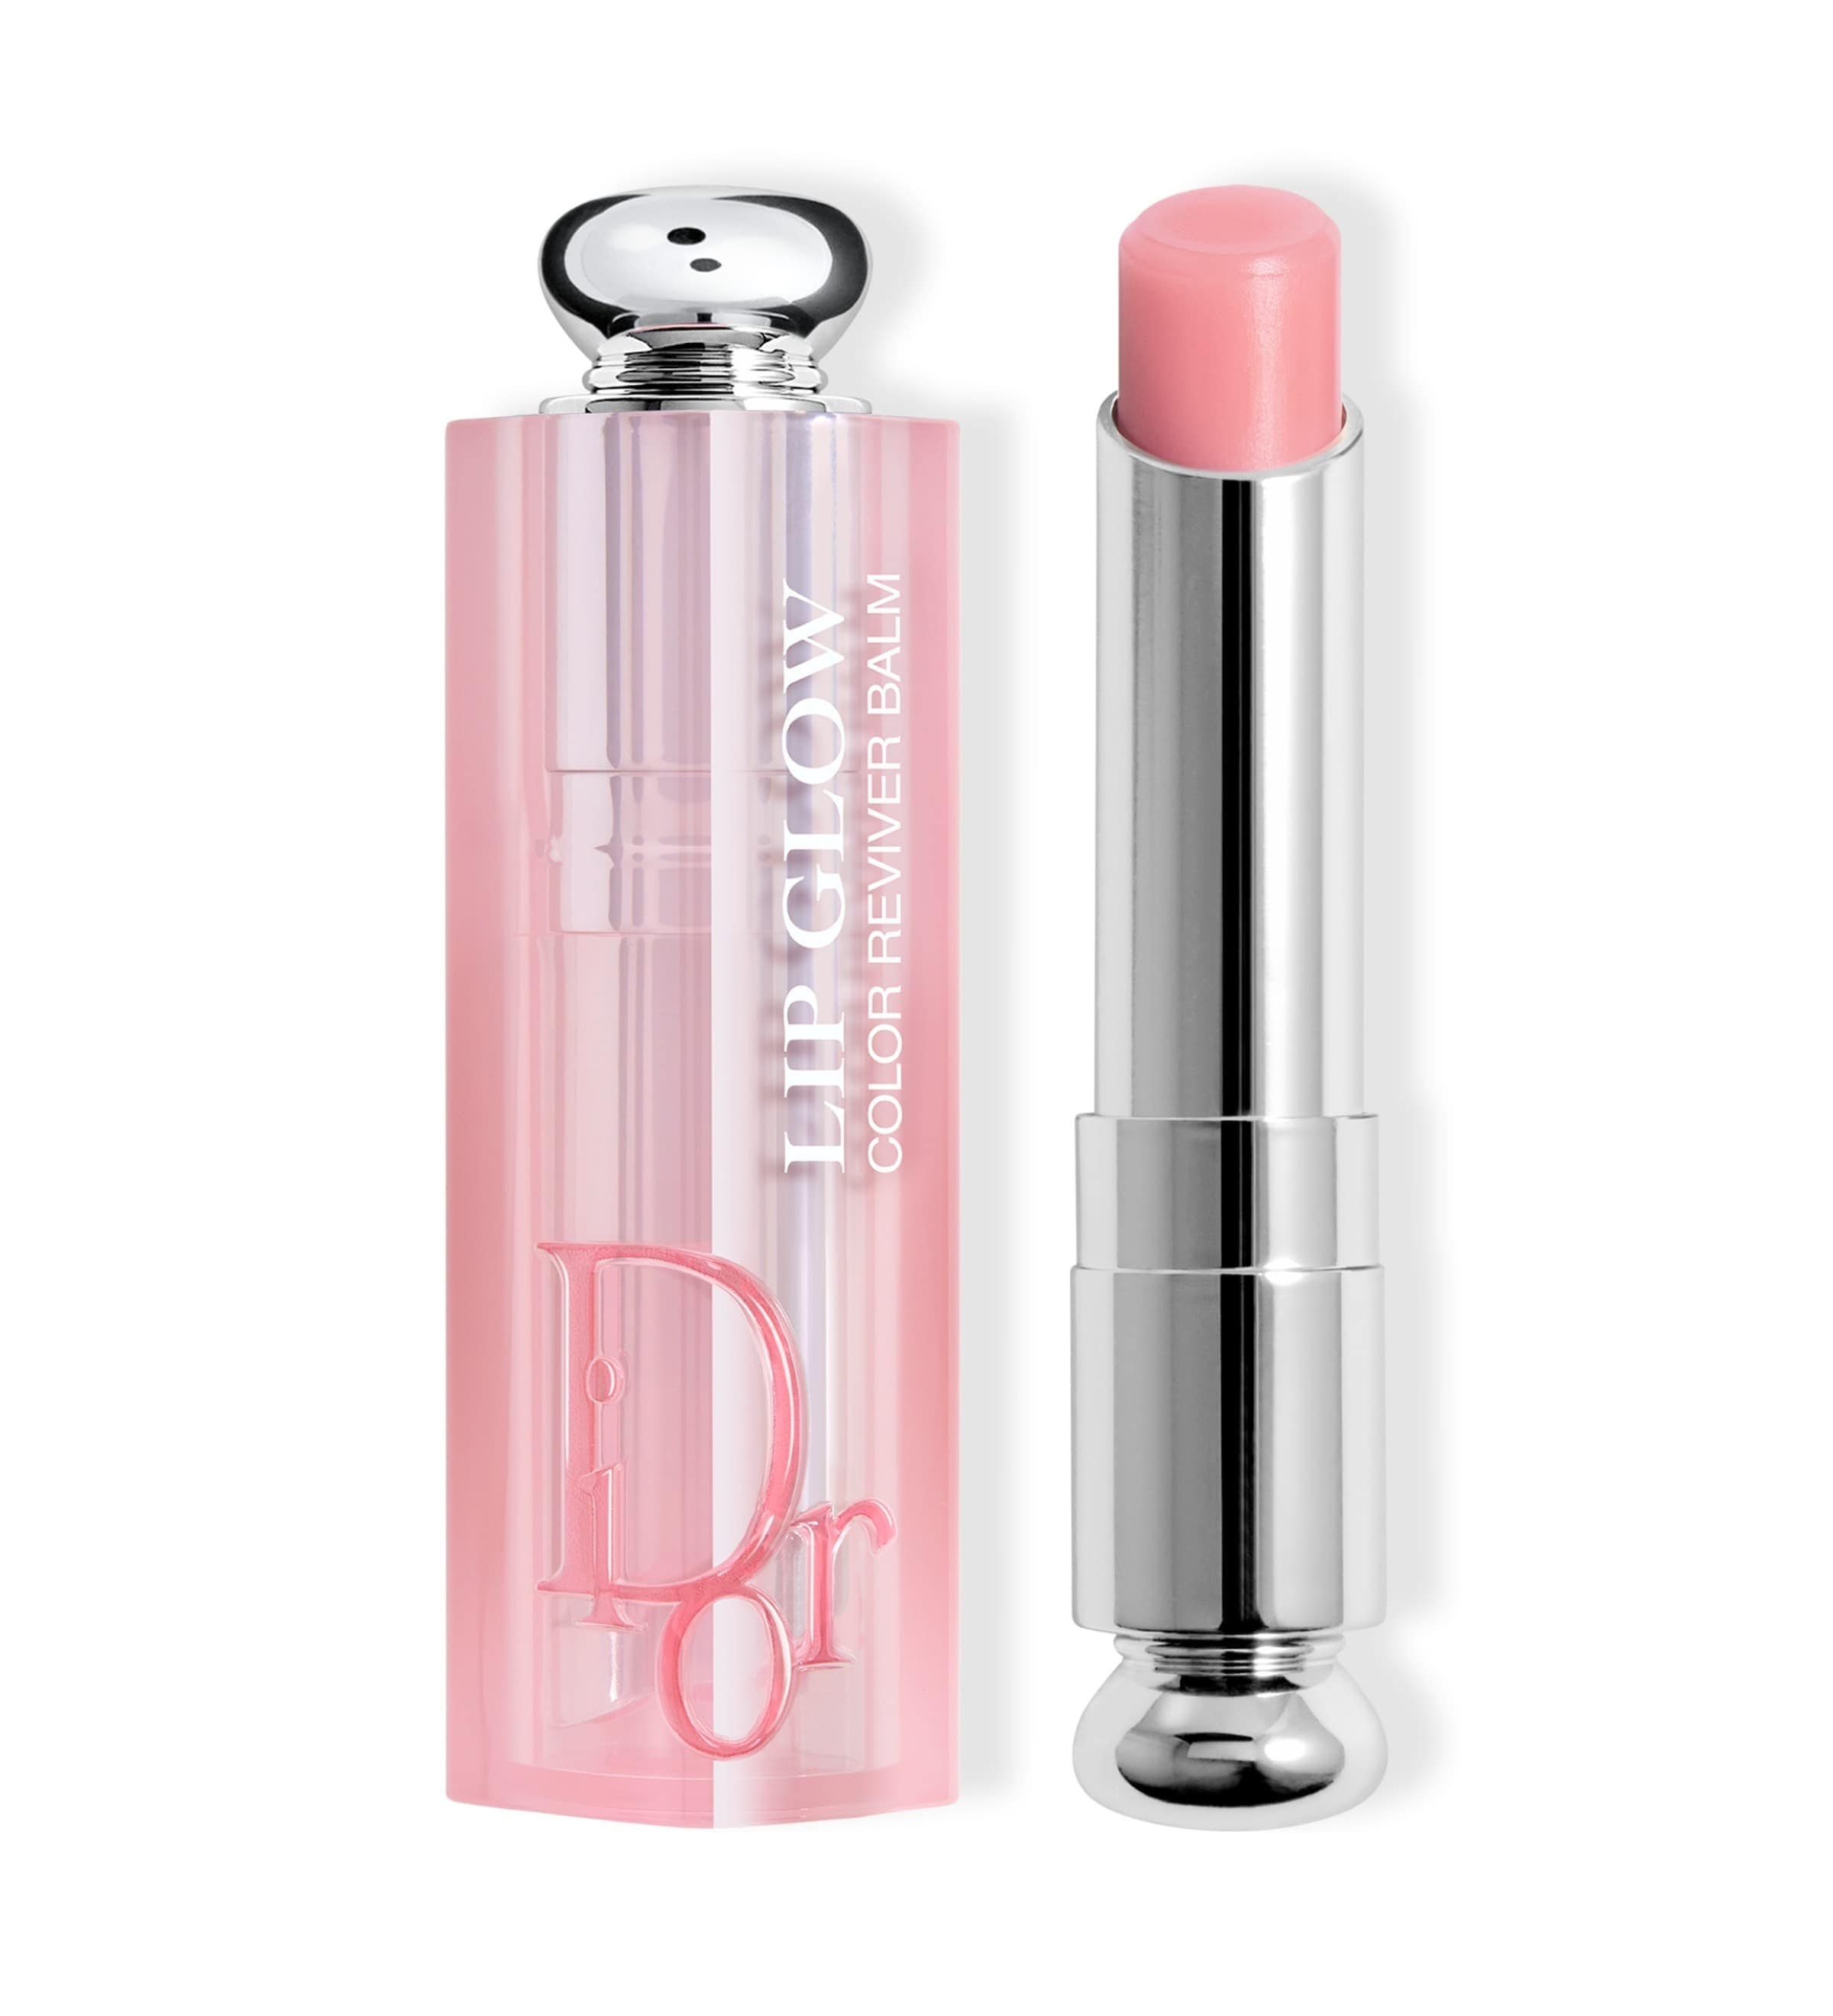 Bálsamo de labios Addict Lip Glow de Dior